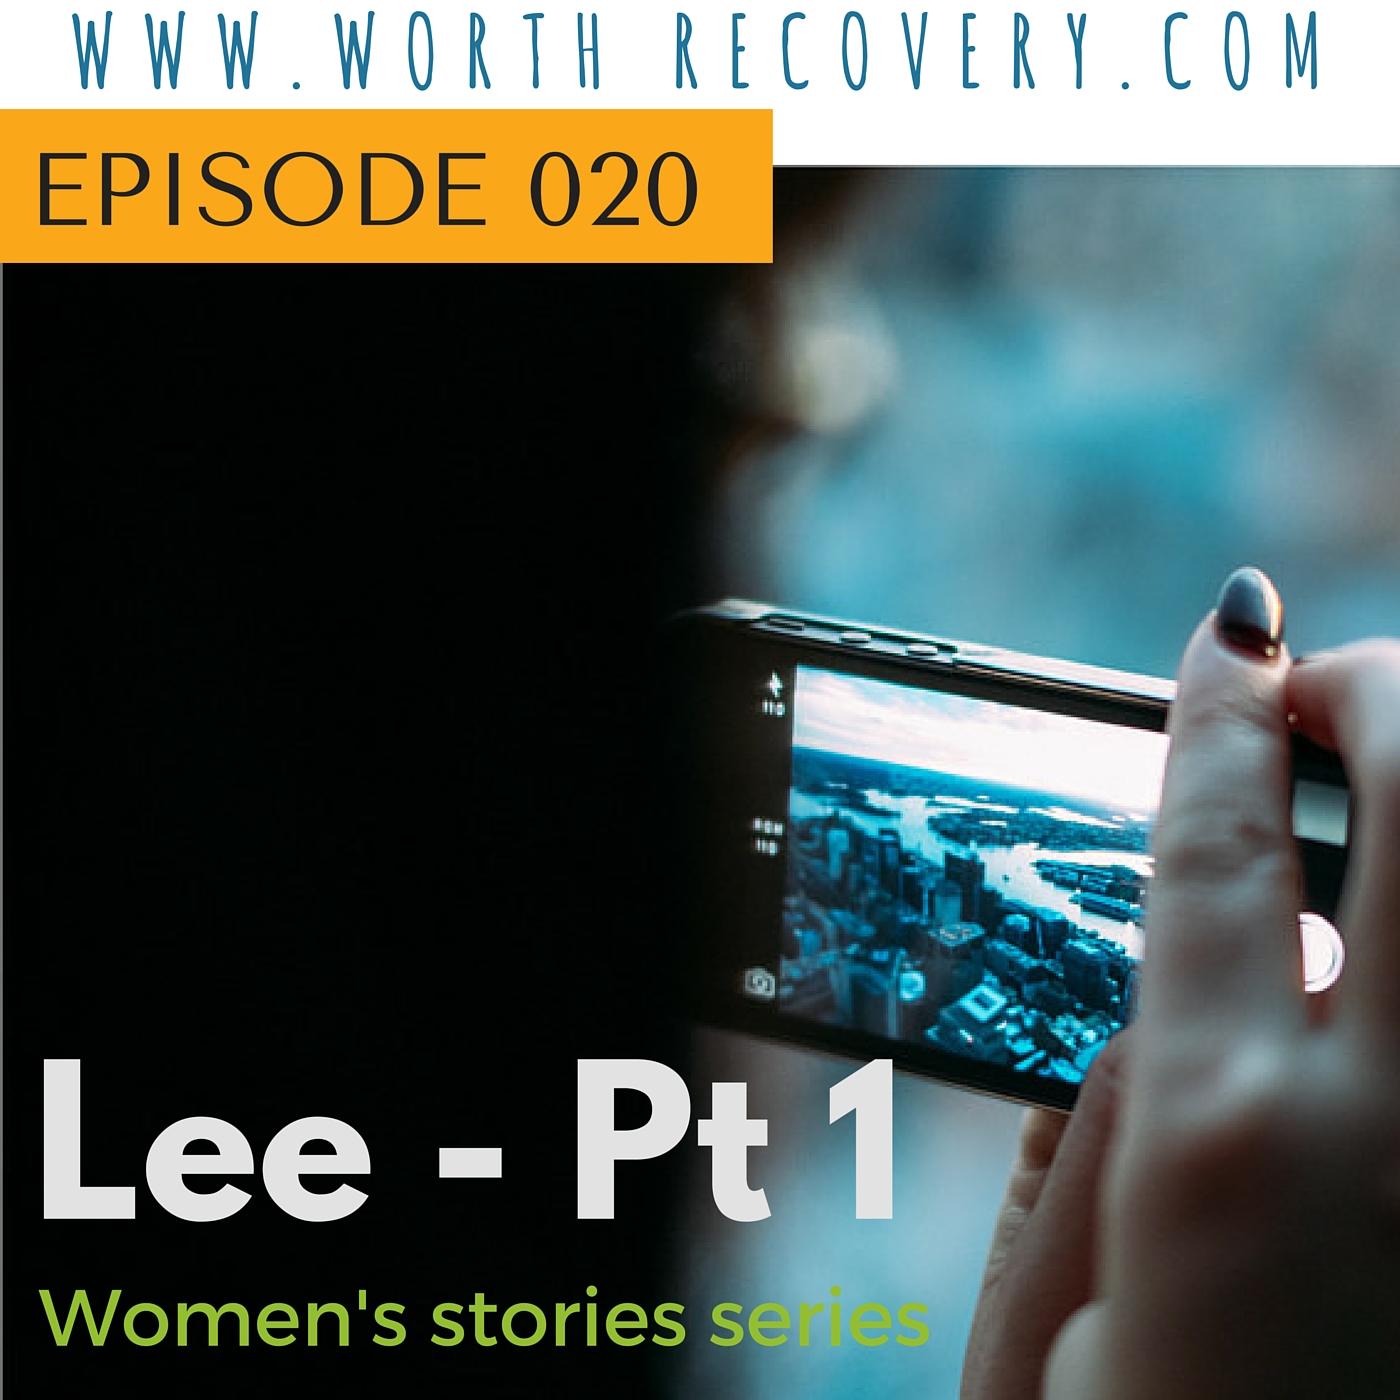 Ep 020: Women's Stories Series: Lee – Part 1